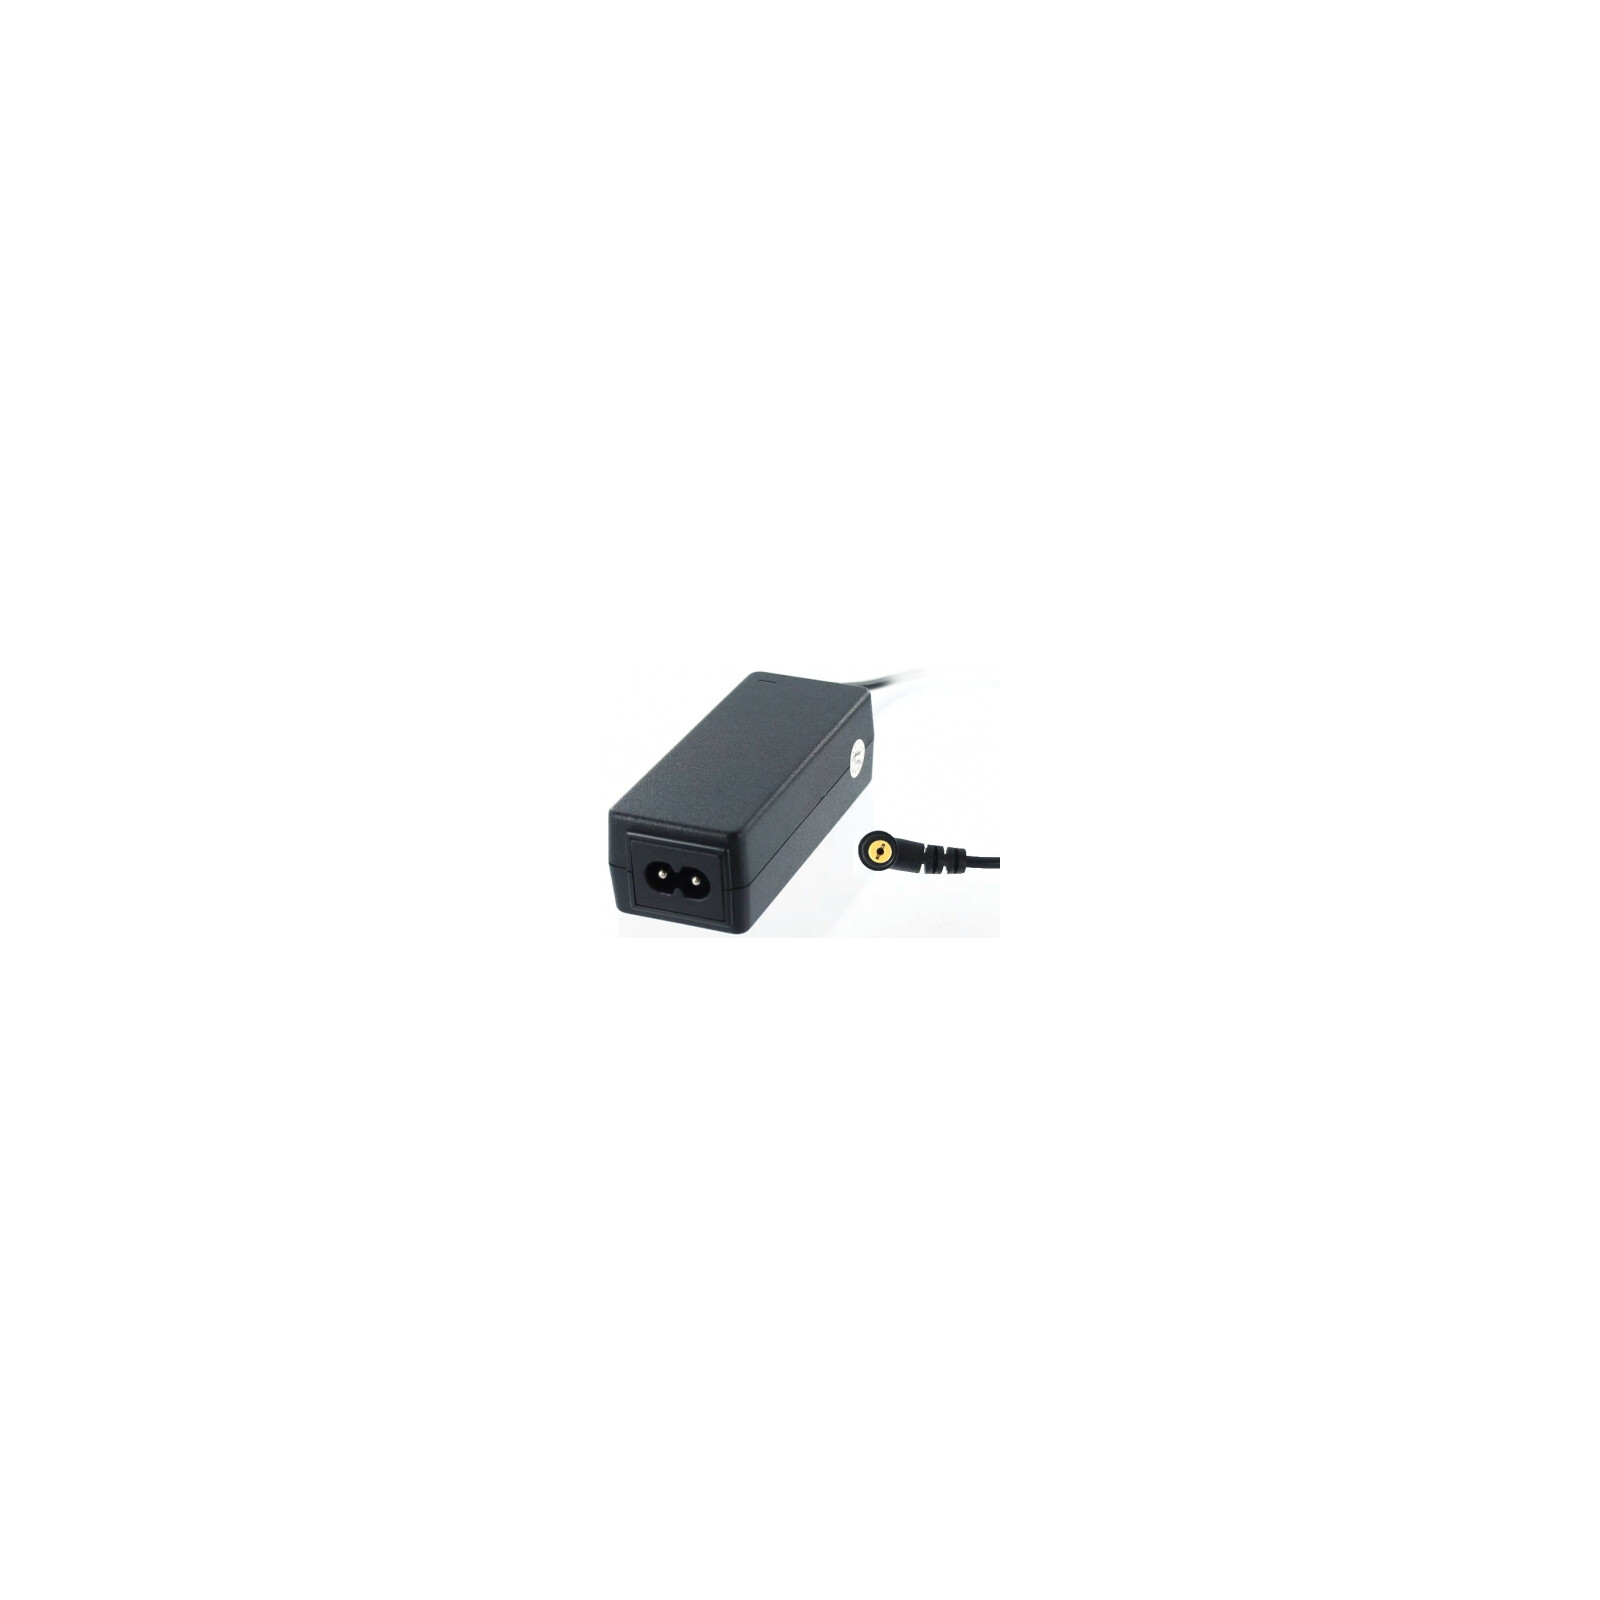 AGI Netzteil Acer ADP-40TH A 40W